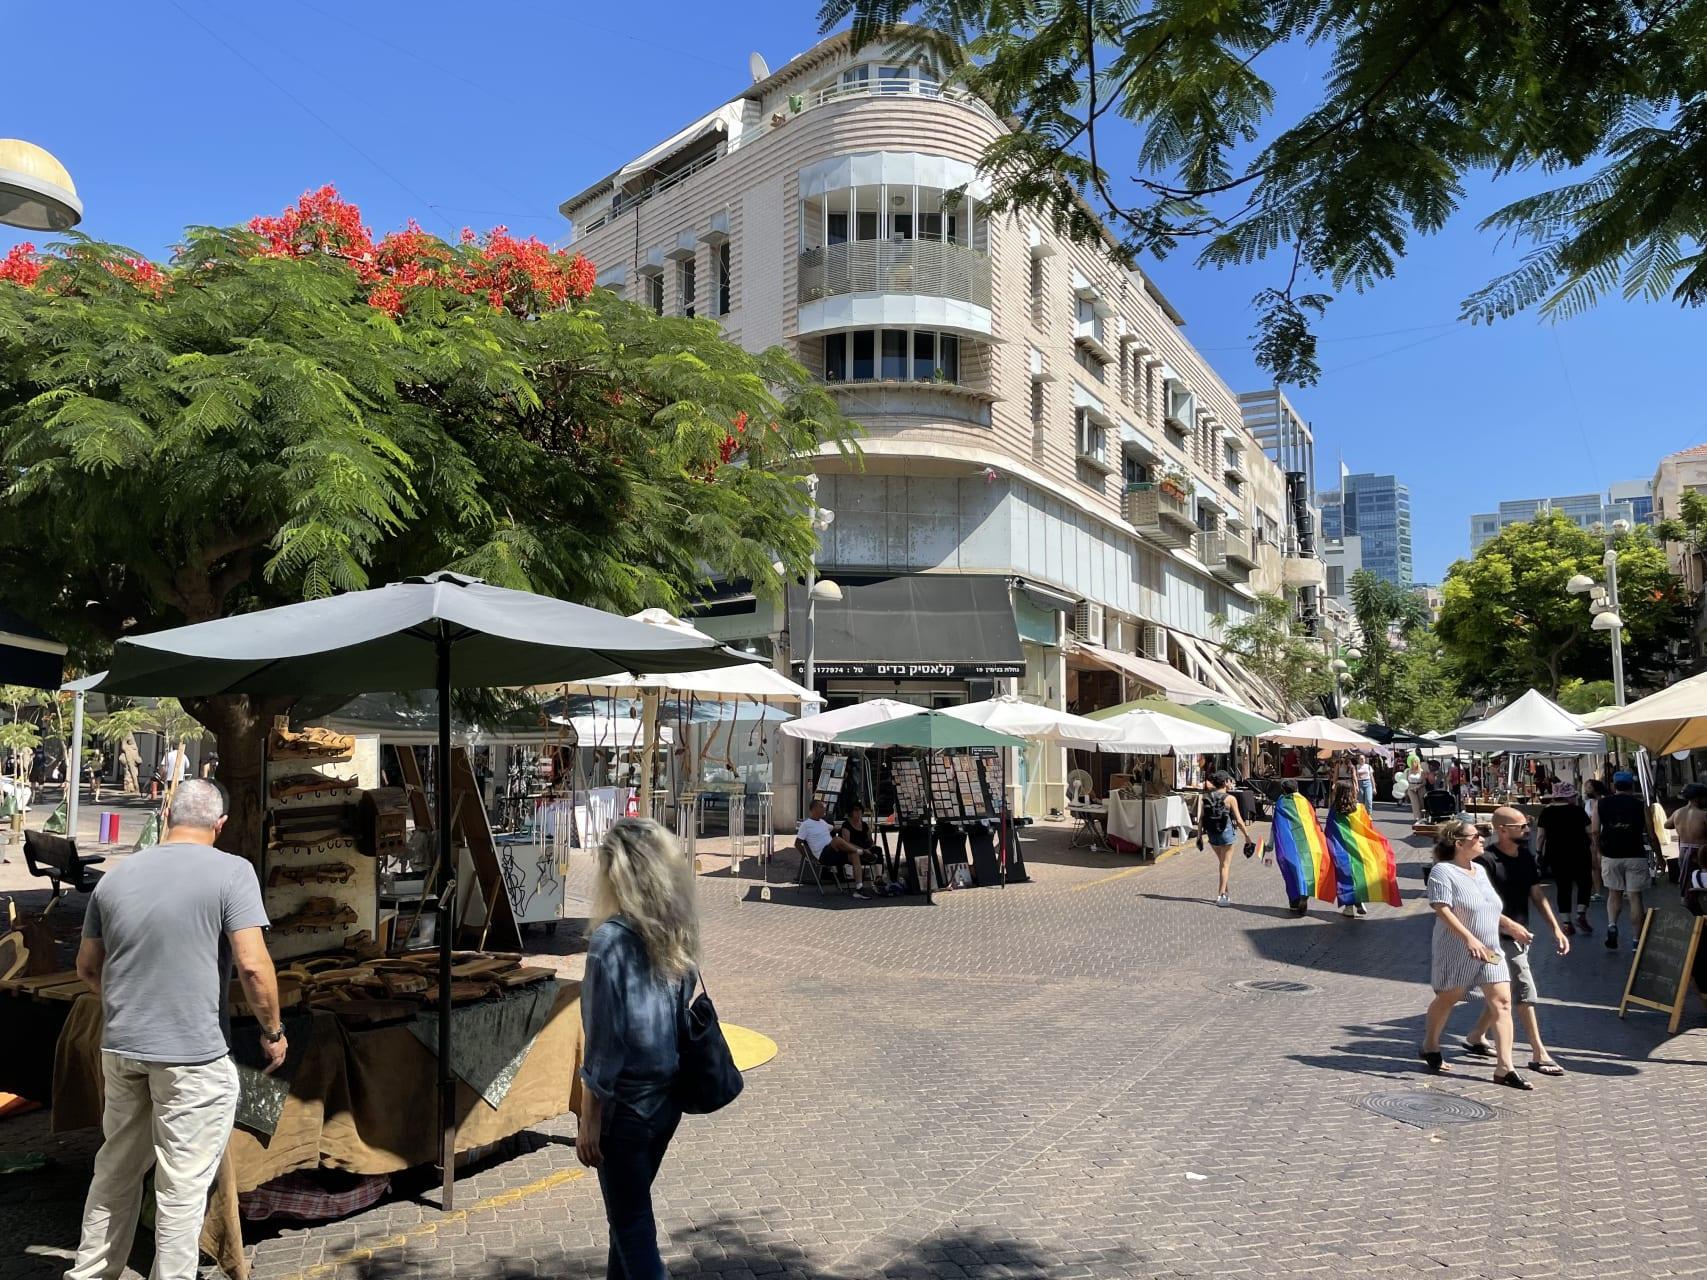 Tel Aviv - Street Art at Nahalat Binyamin Craft Market